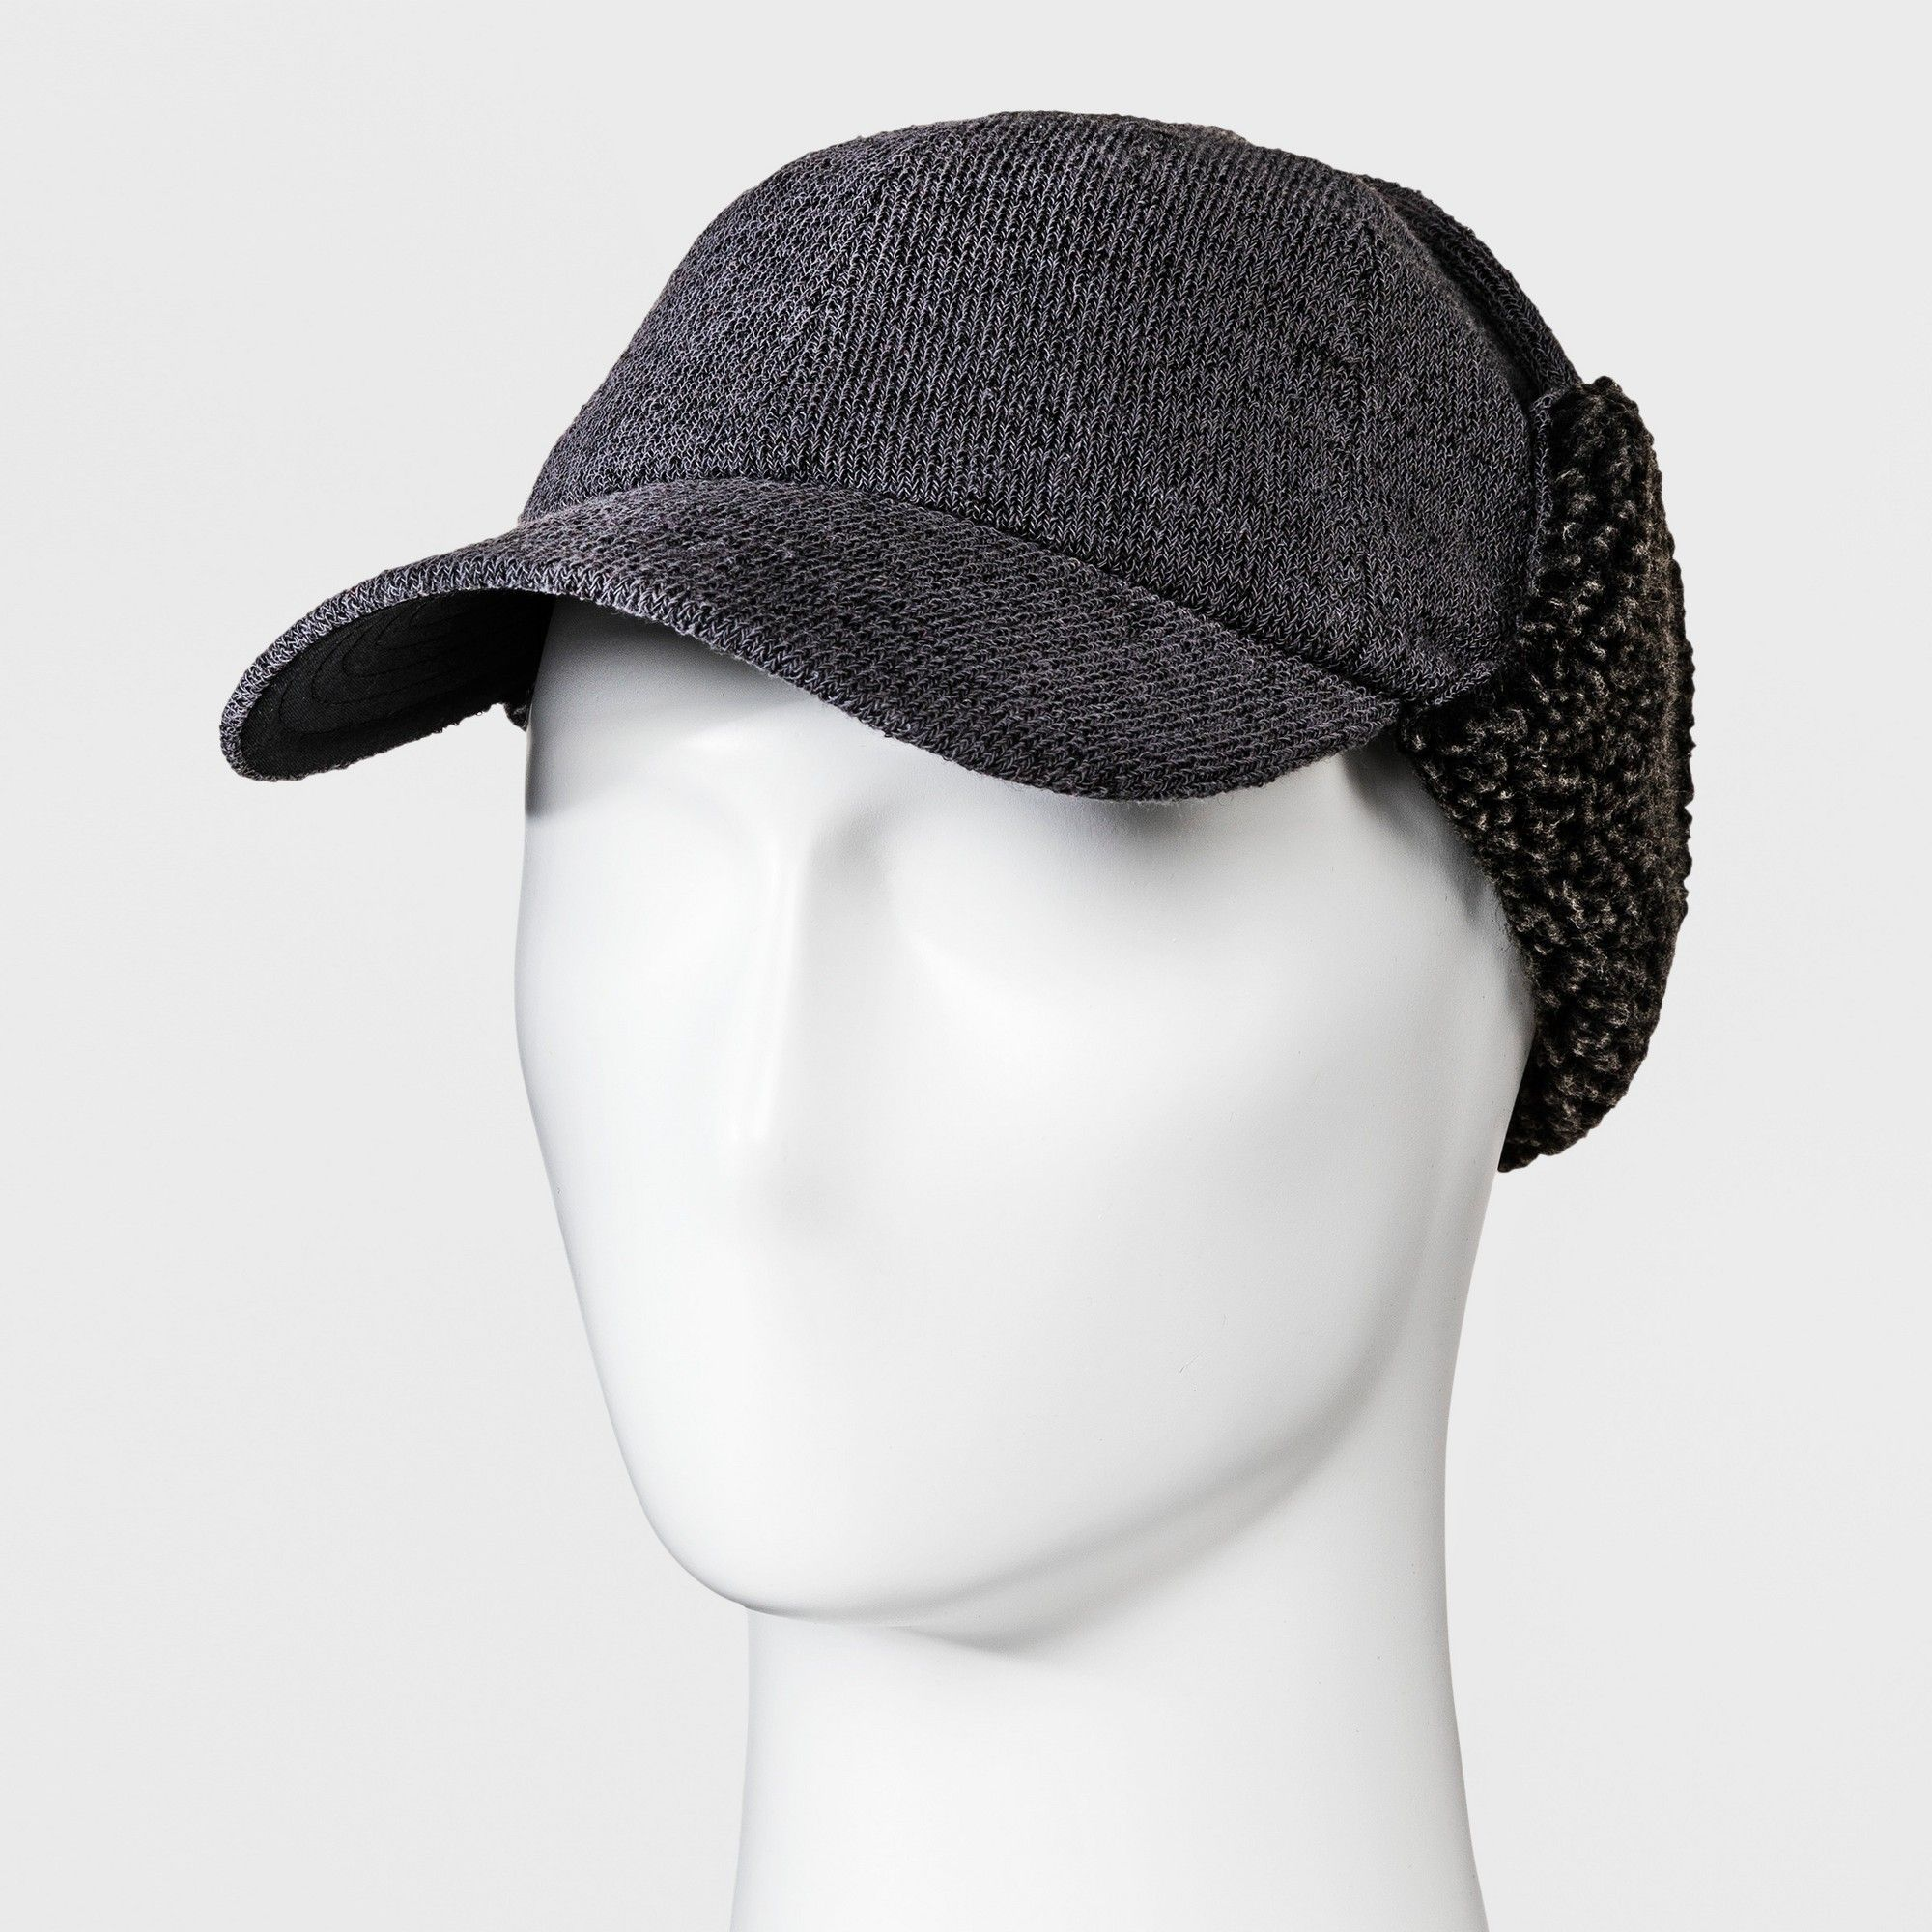 69152842dcd73 Men s Fleece Flap Baseball Hat - Goodfellow   Co Charcoal Heather L ...